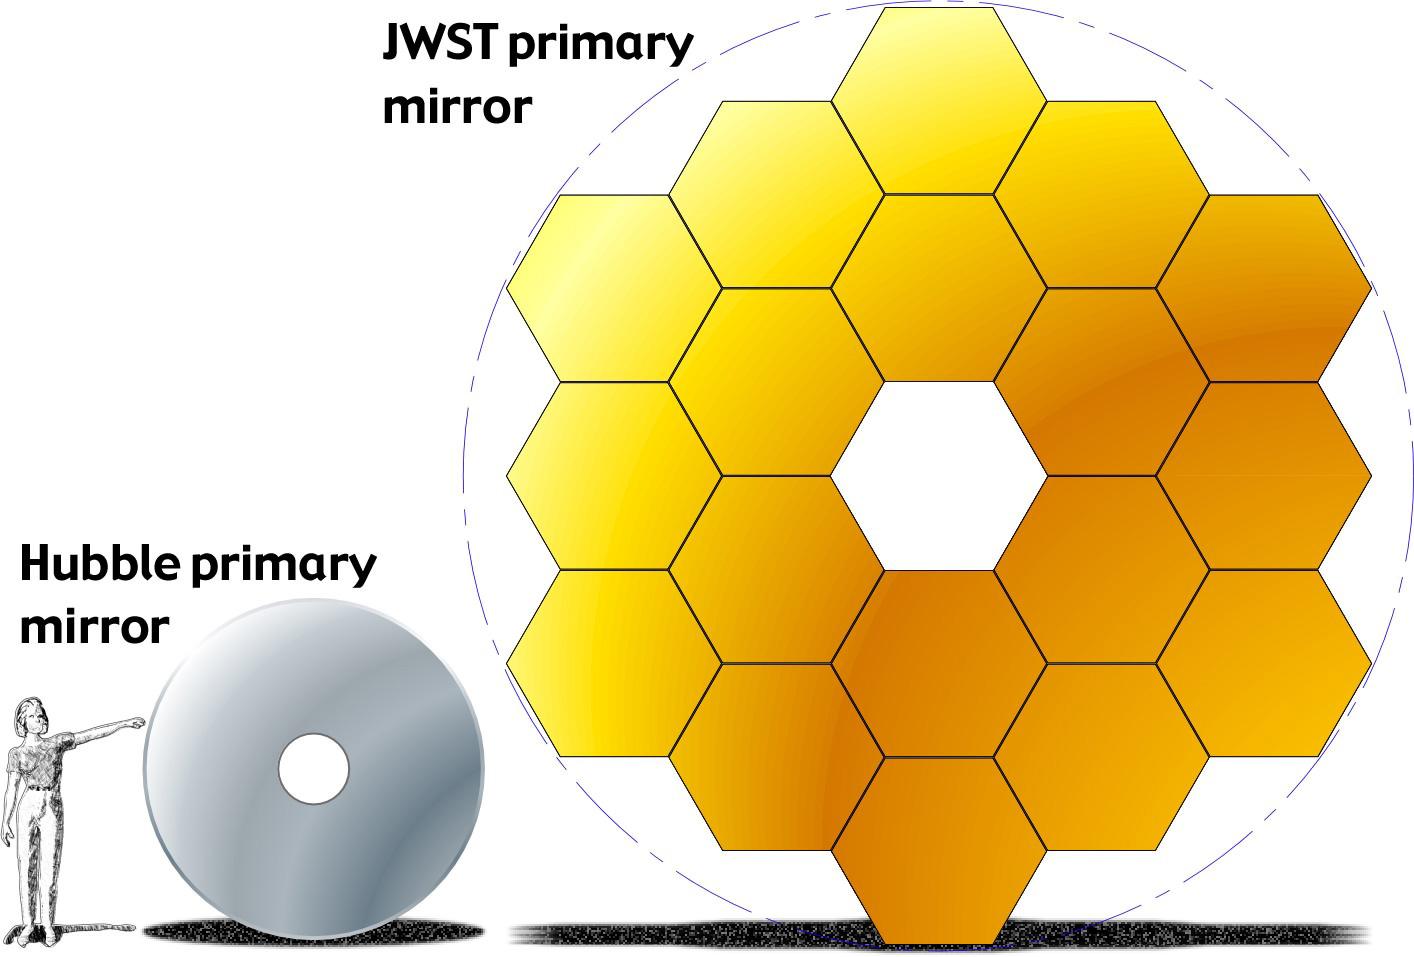 NASA's $8.7 Billion James Webb Space Telescope Will Help Unlock.